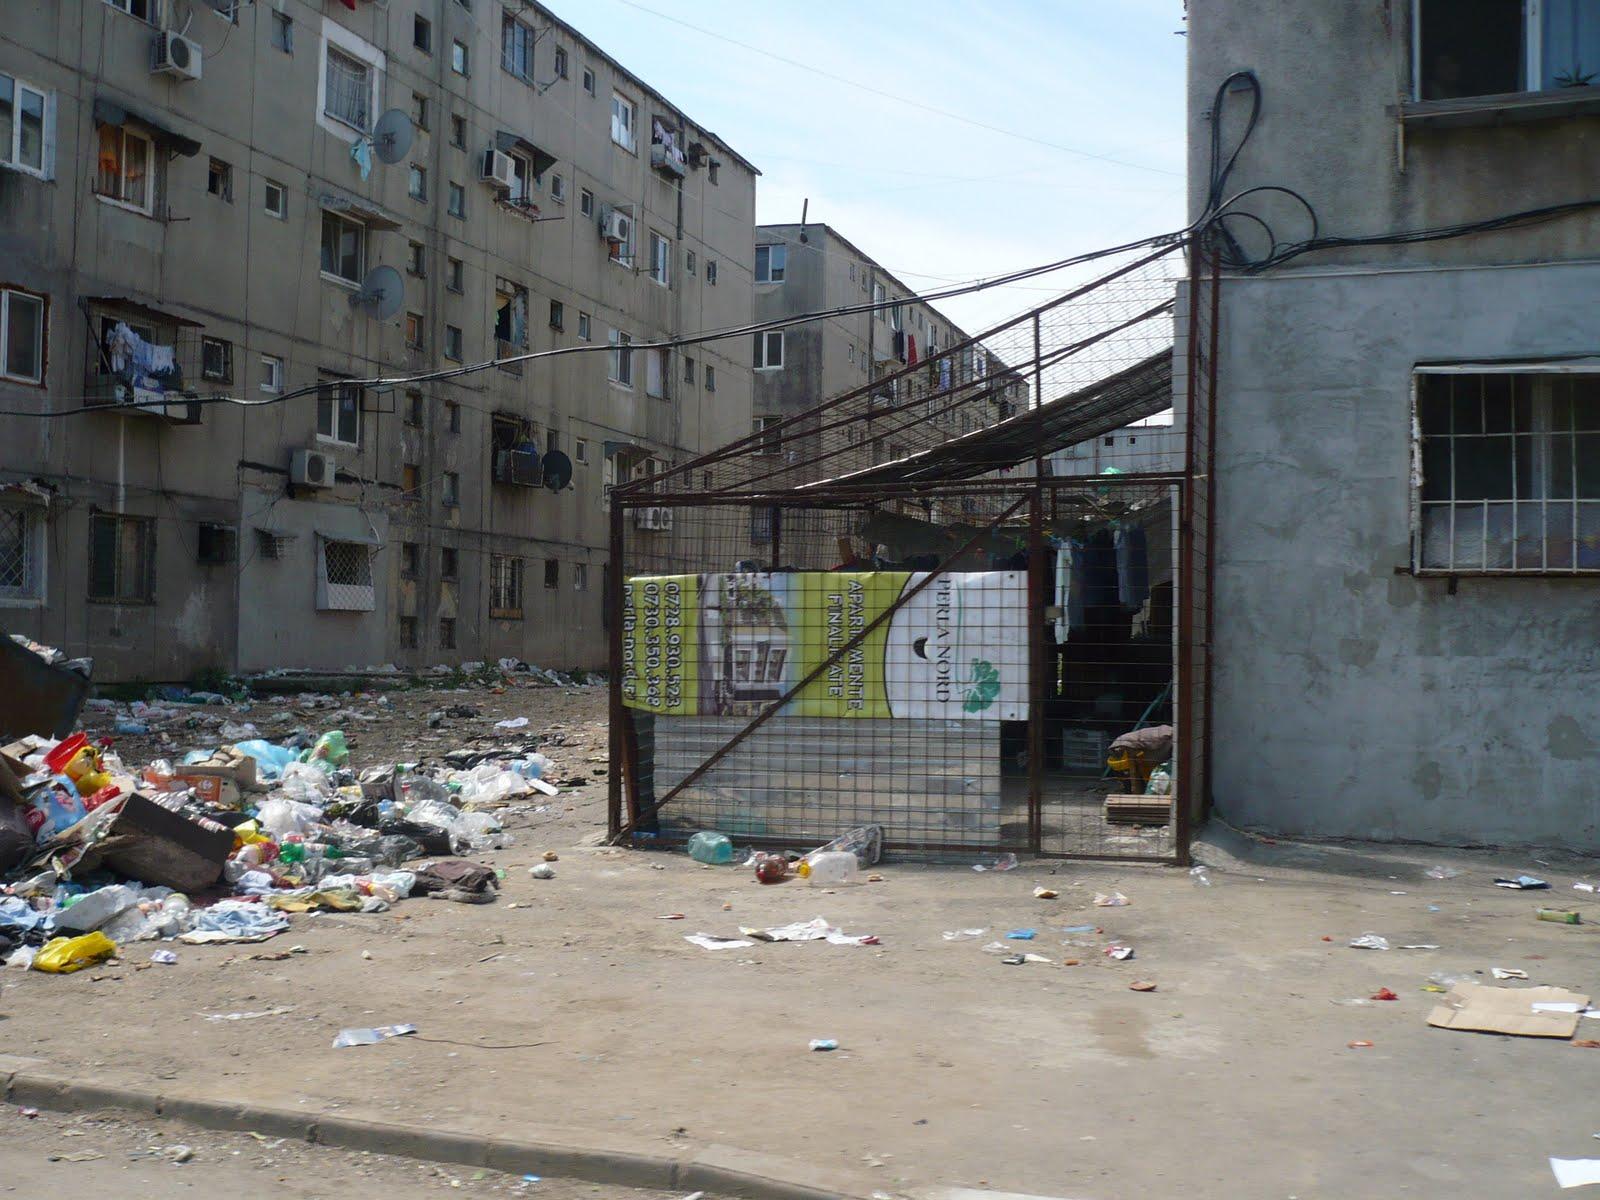 ghetto backgrounds wallpapersafari